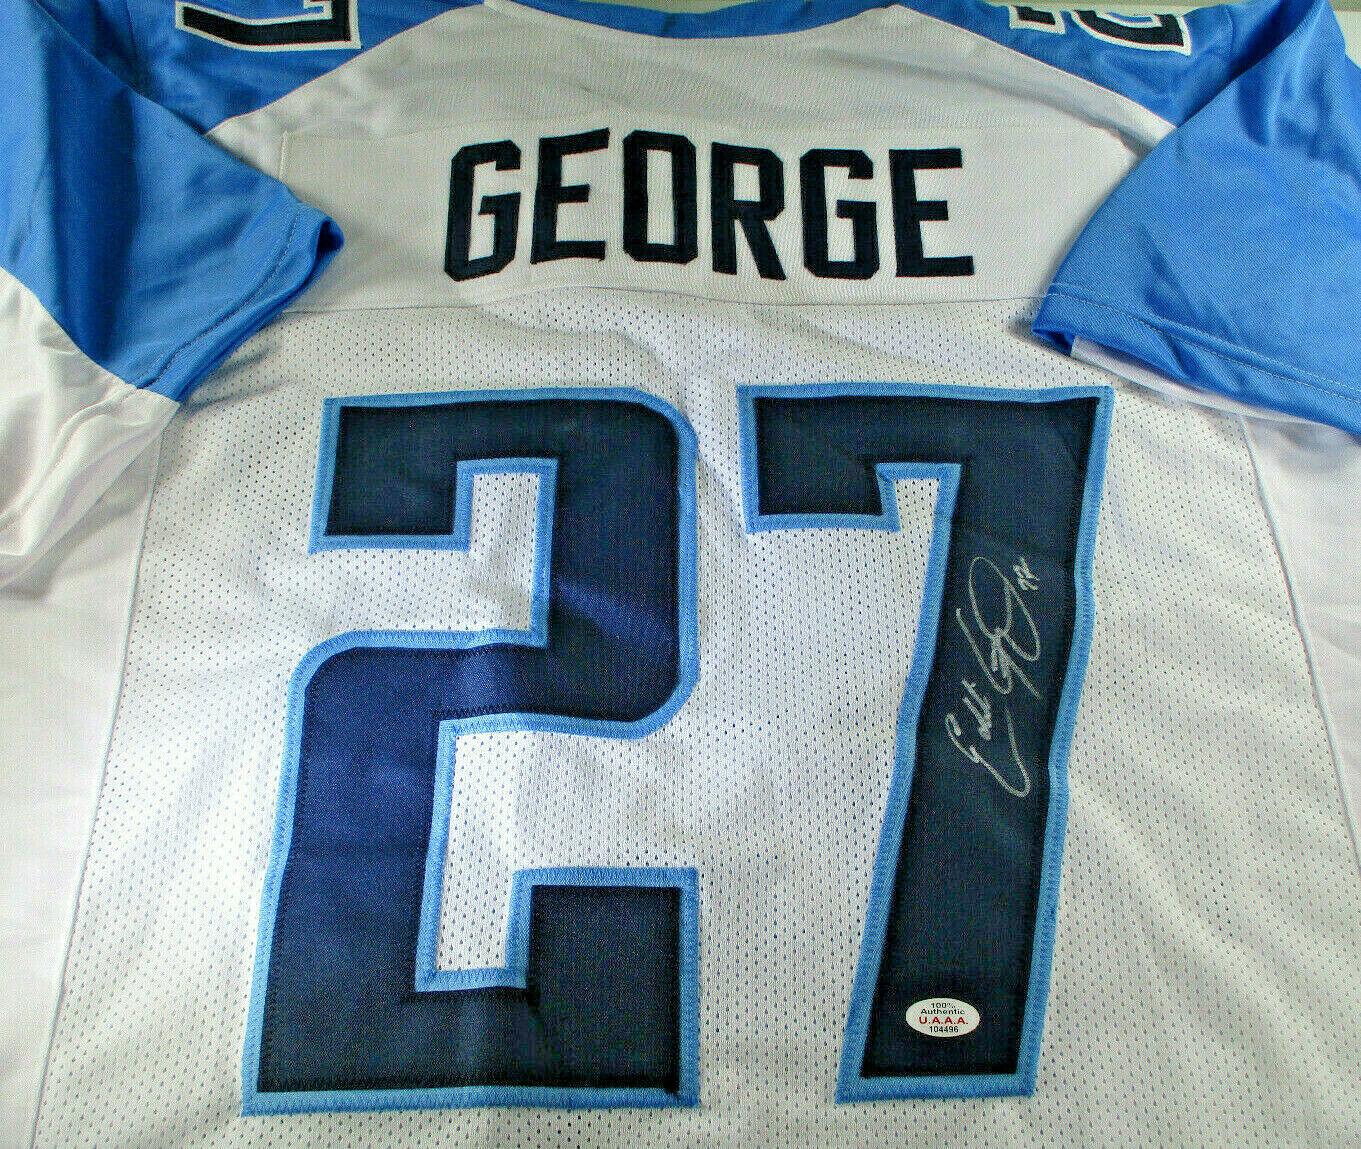 EDDIE GEORGE / AUTOGRAPHED TENNESSEE TITANS WHITE CUSTOM FOOTBALL JERSEY / COA